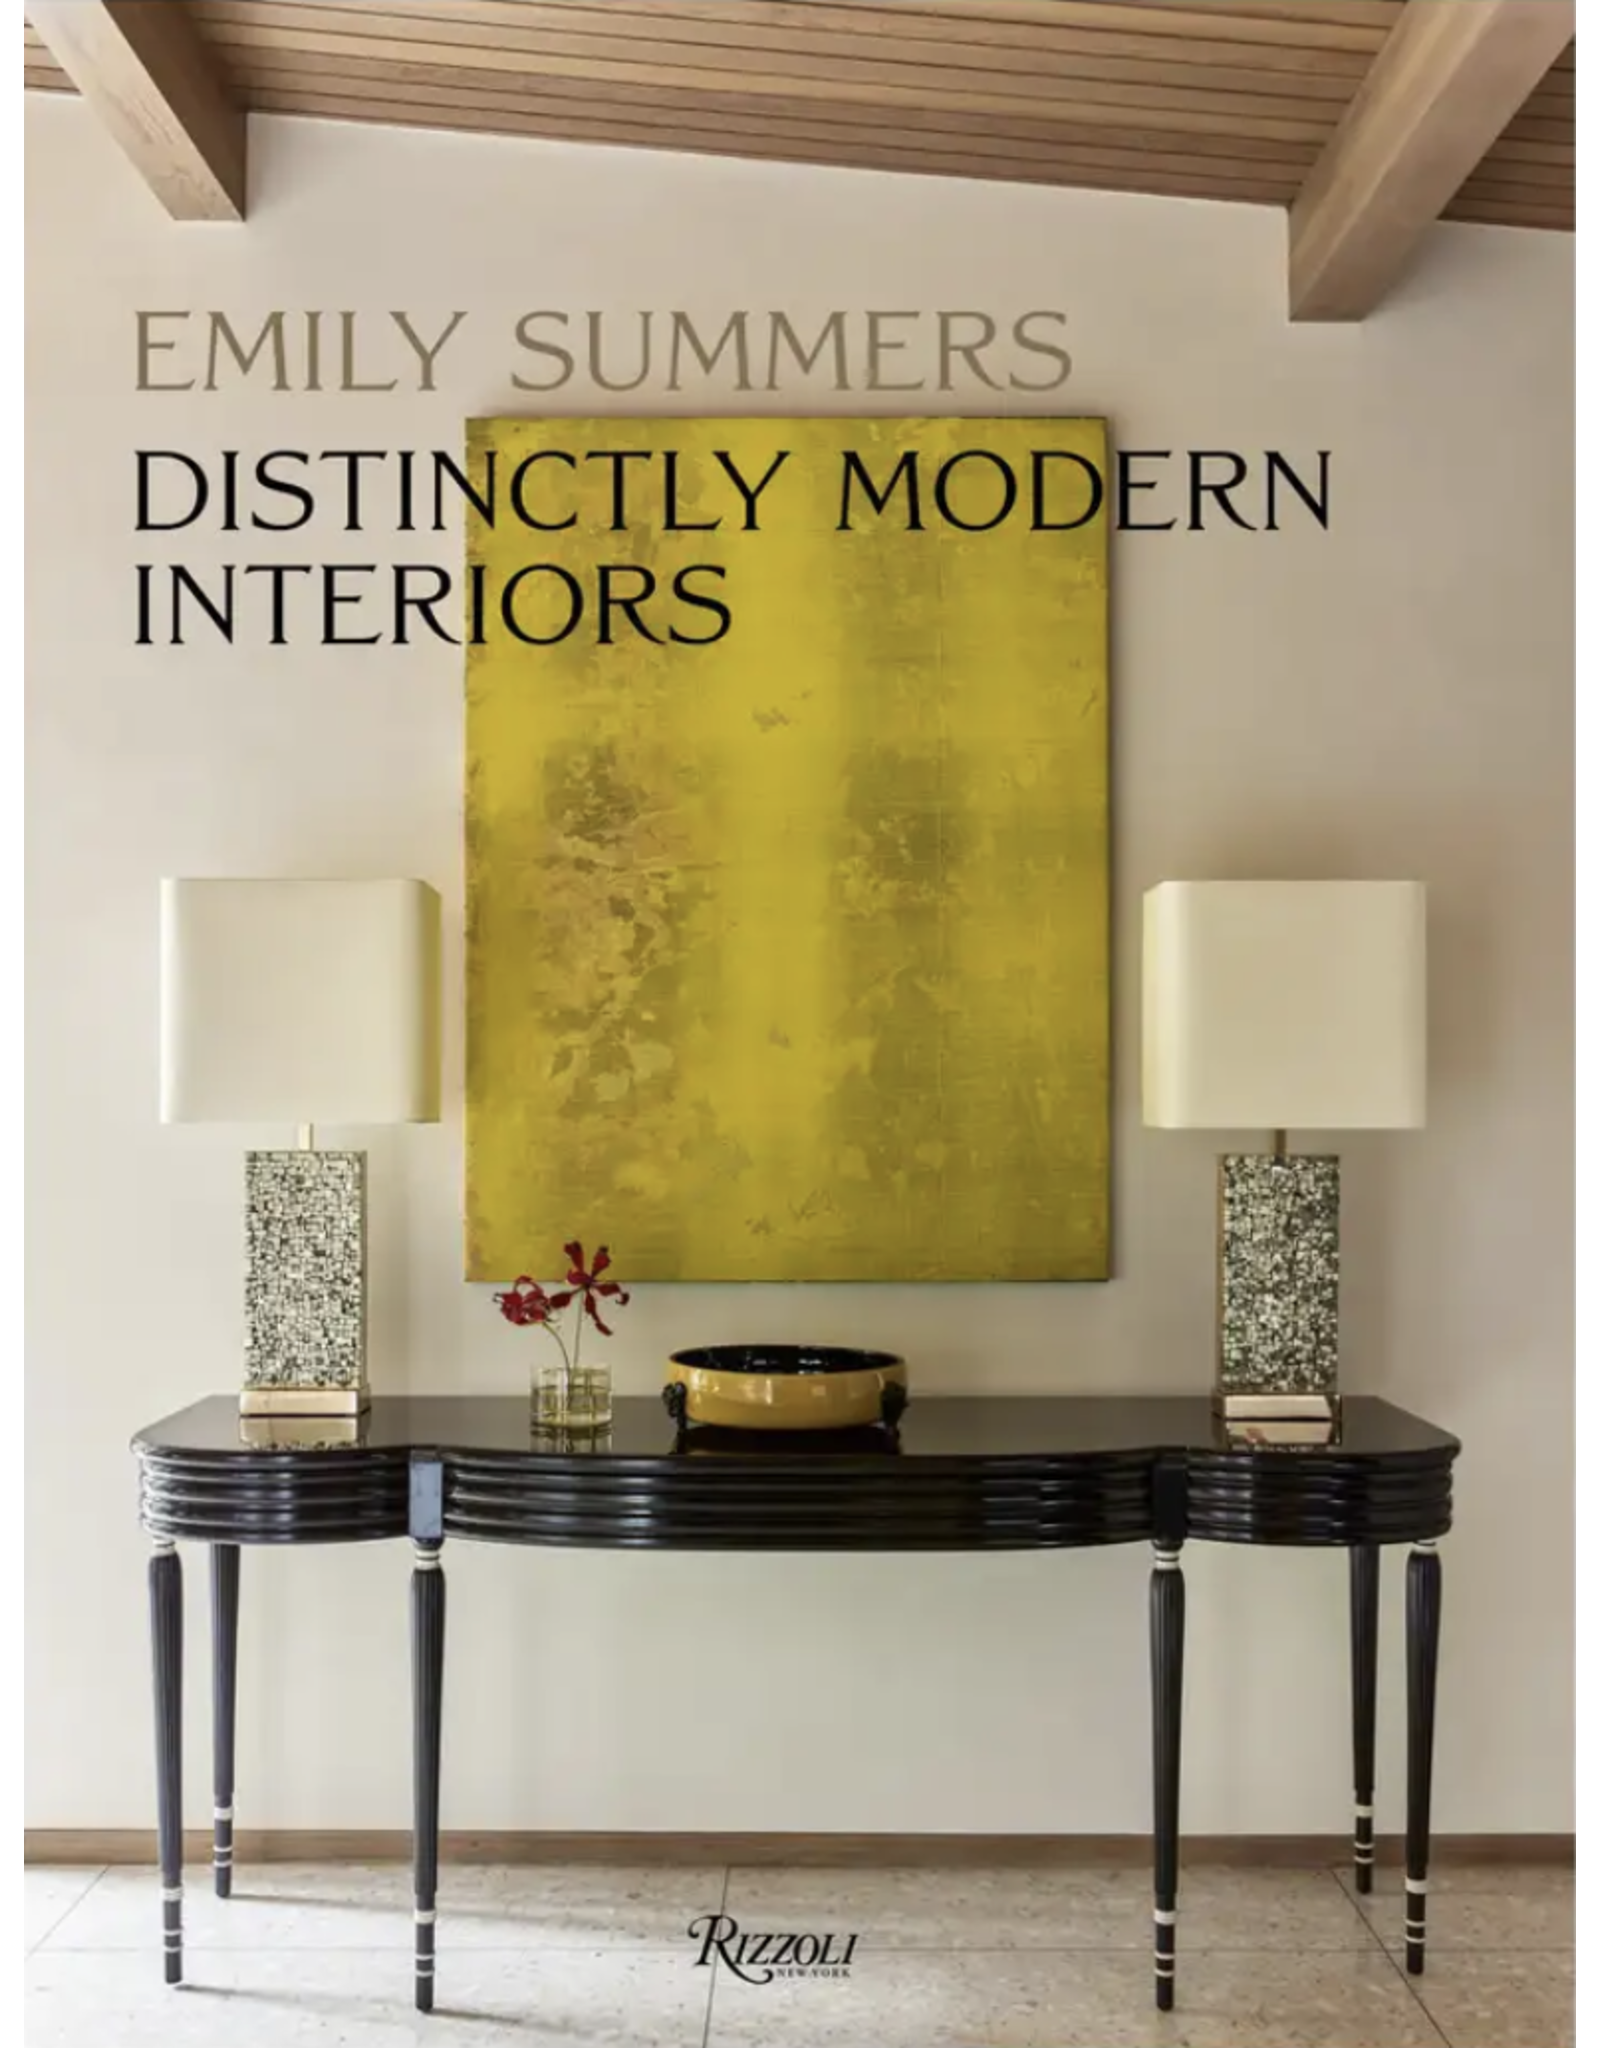 Website Distinctly Modern Interiors